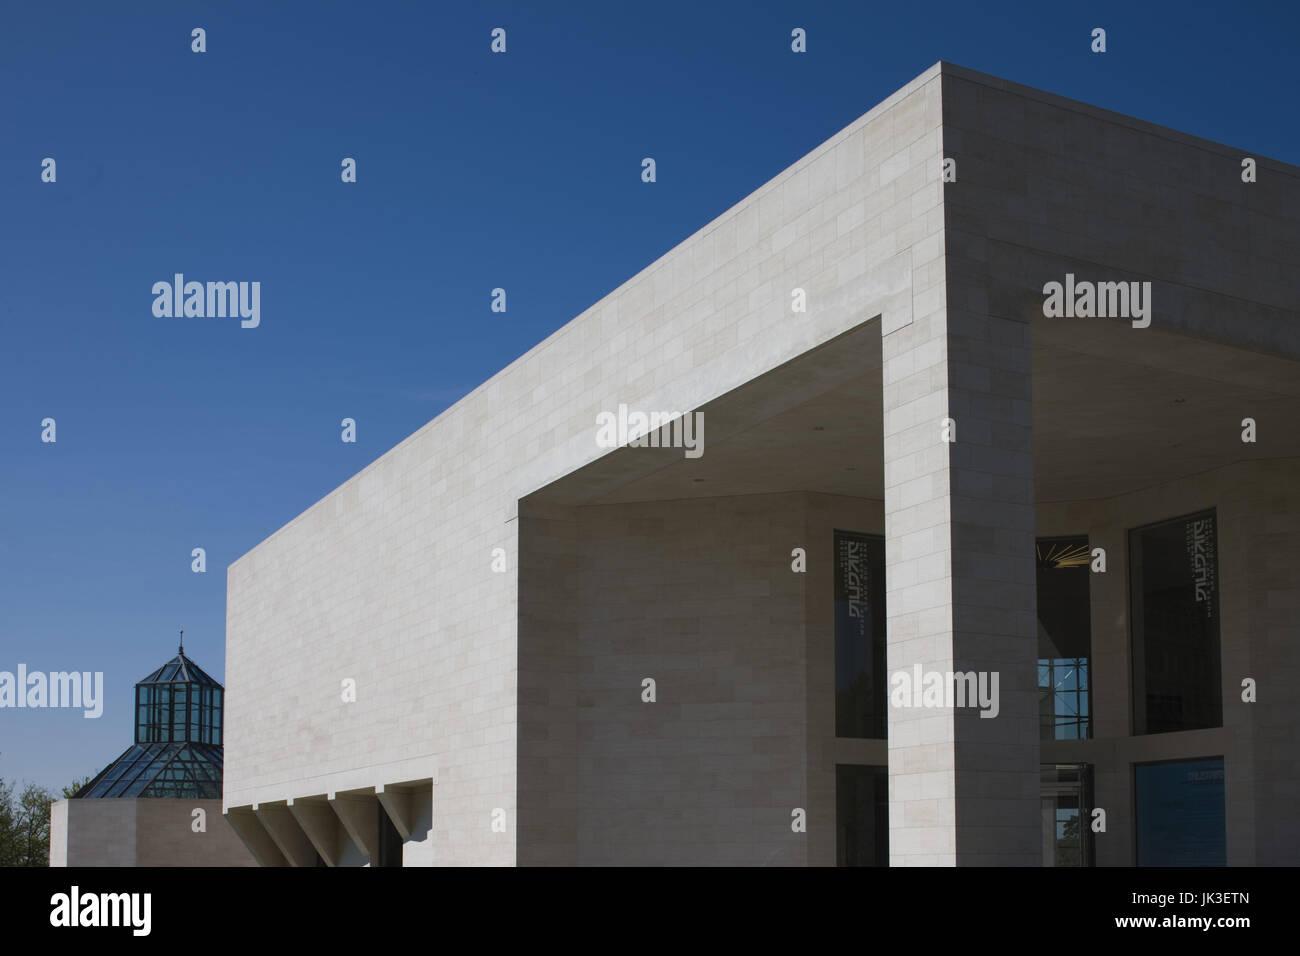 Luxembourg, Luxembourg City, Plateau de Kirchberg, Musee d' Art Moderne Grand-Duc Jean, modern art museum, Stock Photo